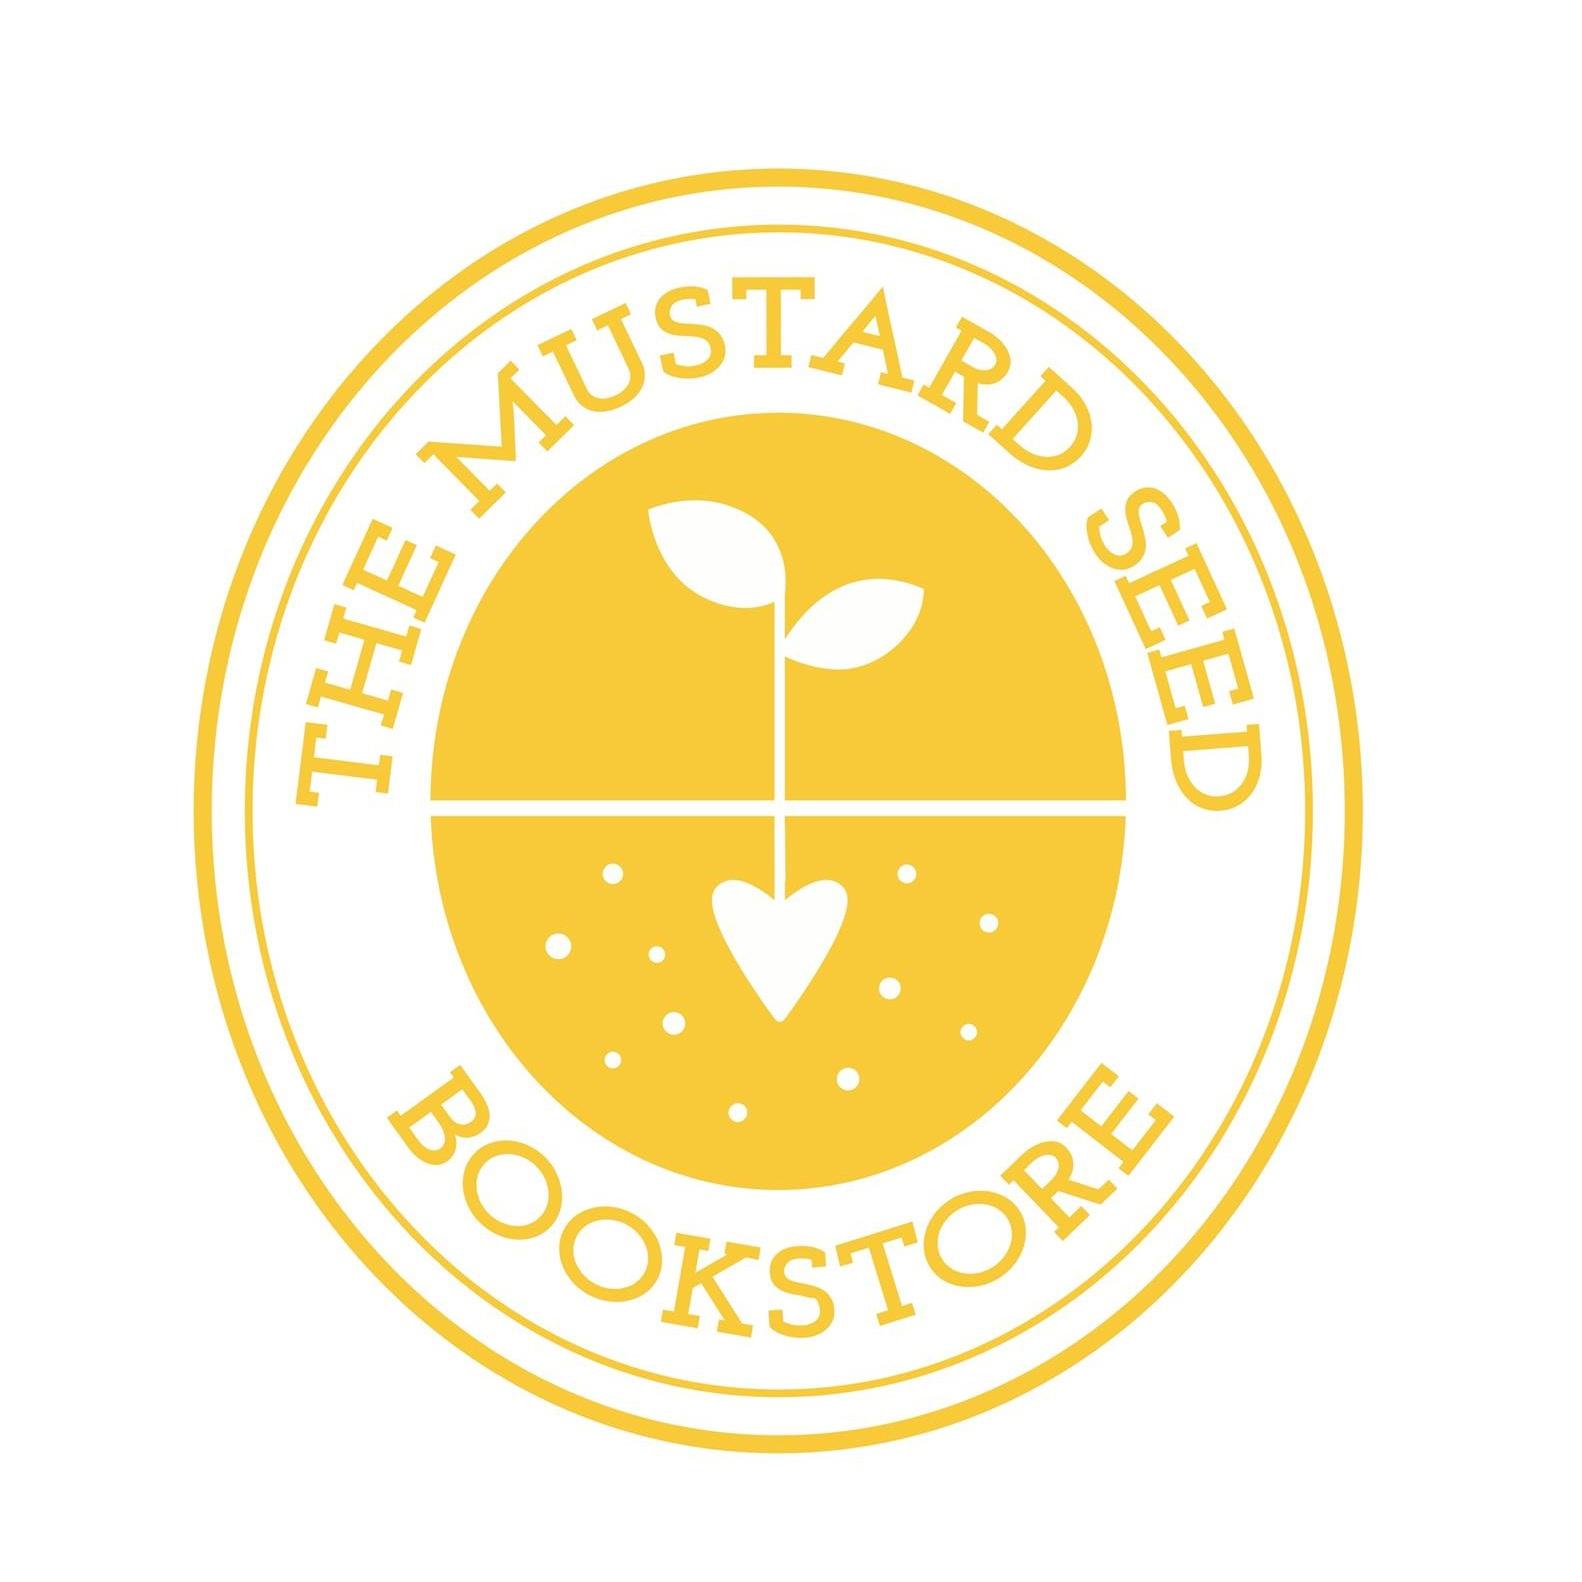 Mustard+Seed+Bookstore.jpg